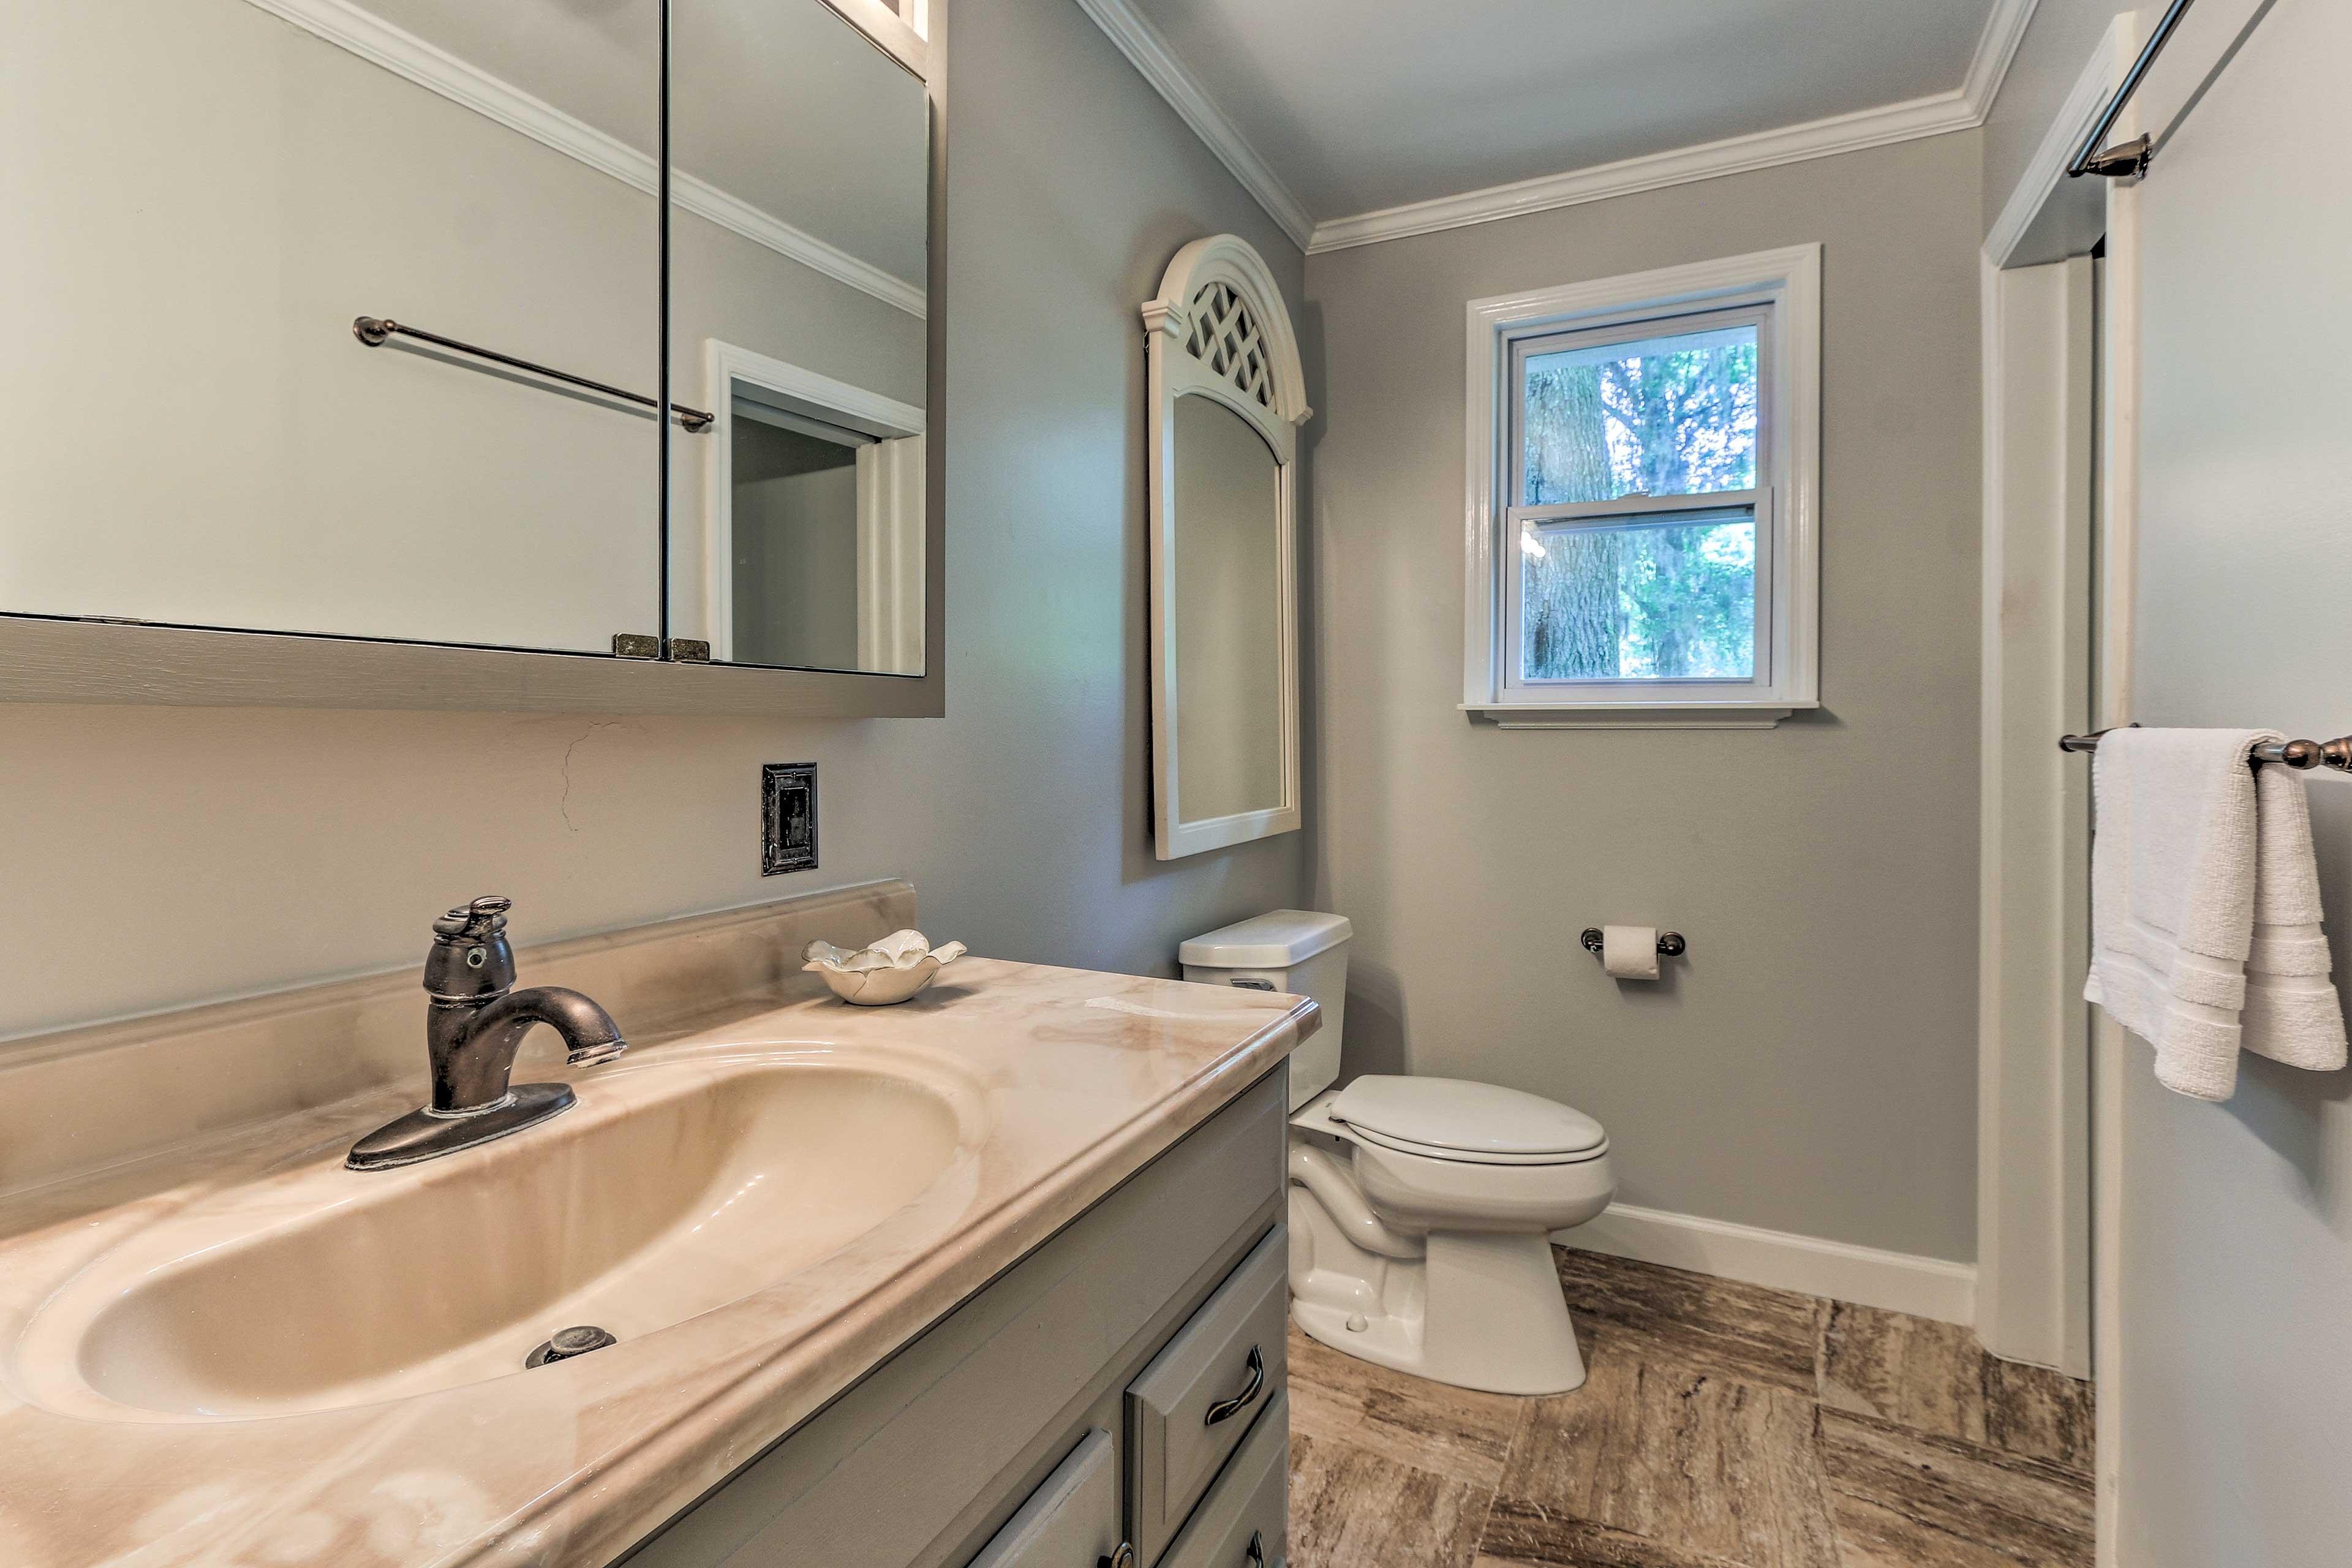 This home has 3 pristine bathrooms.